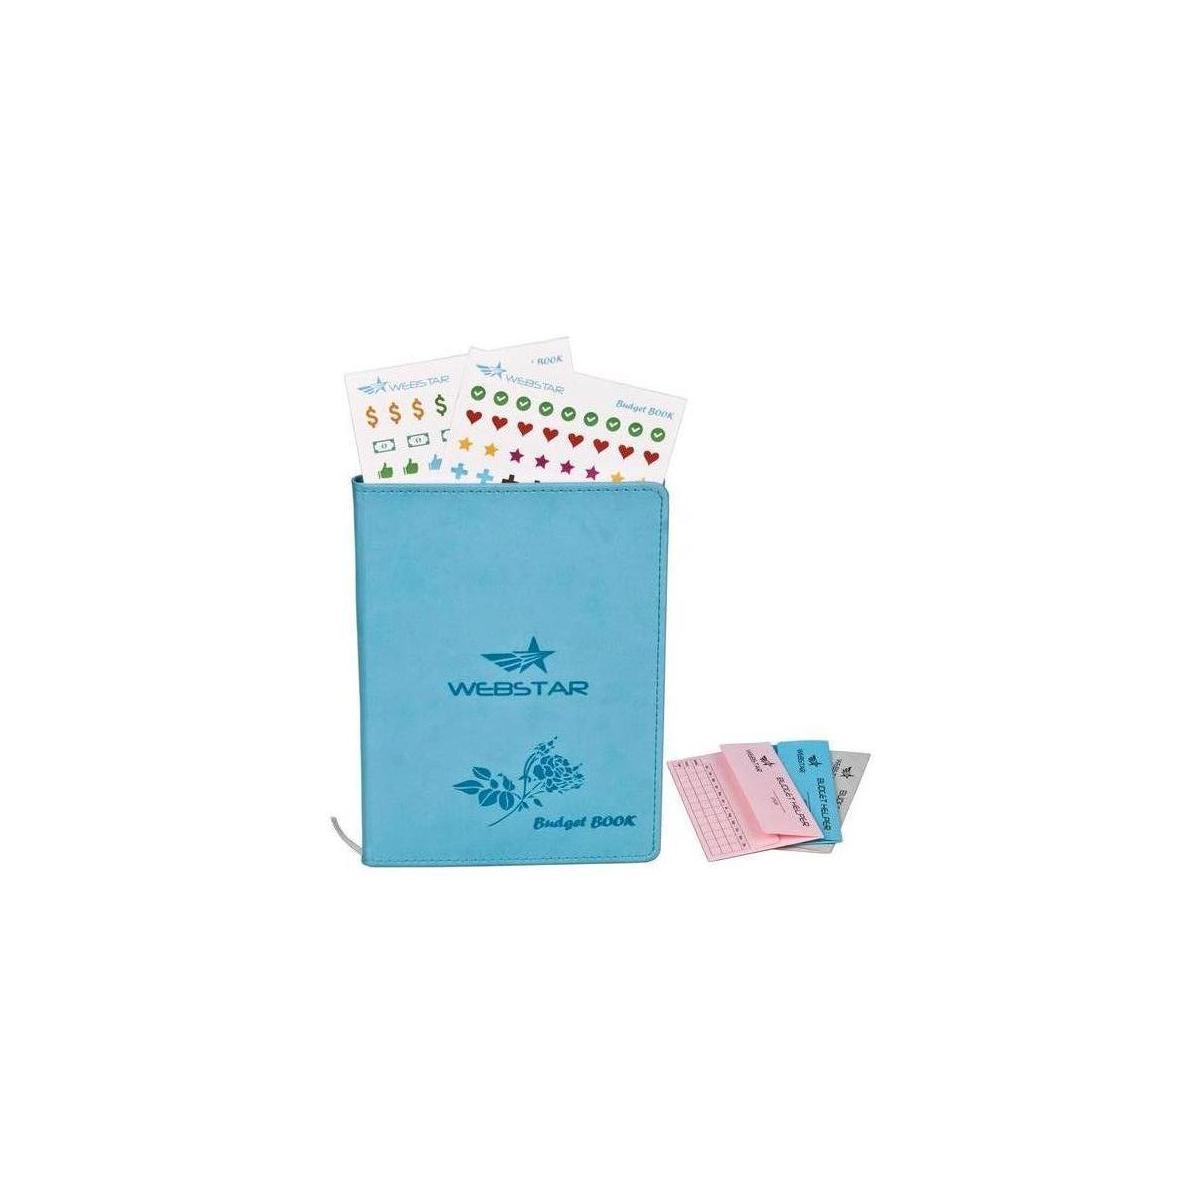 3 Budget Envelopes /& 160 Stickers Bonus Turquoise Undated Hardcover Monthly Tracker 8.2 x 5.9 Notebook Webstar Budget Book Planner Organizer Journal